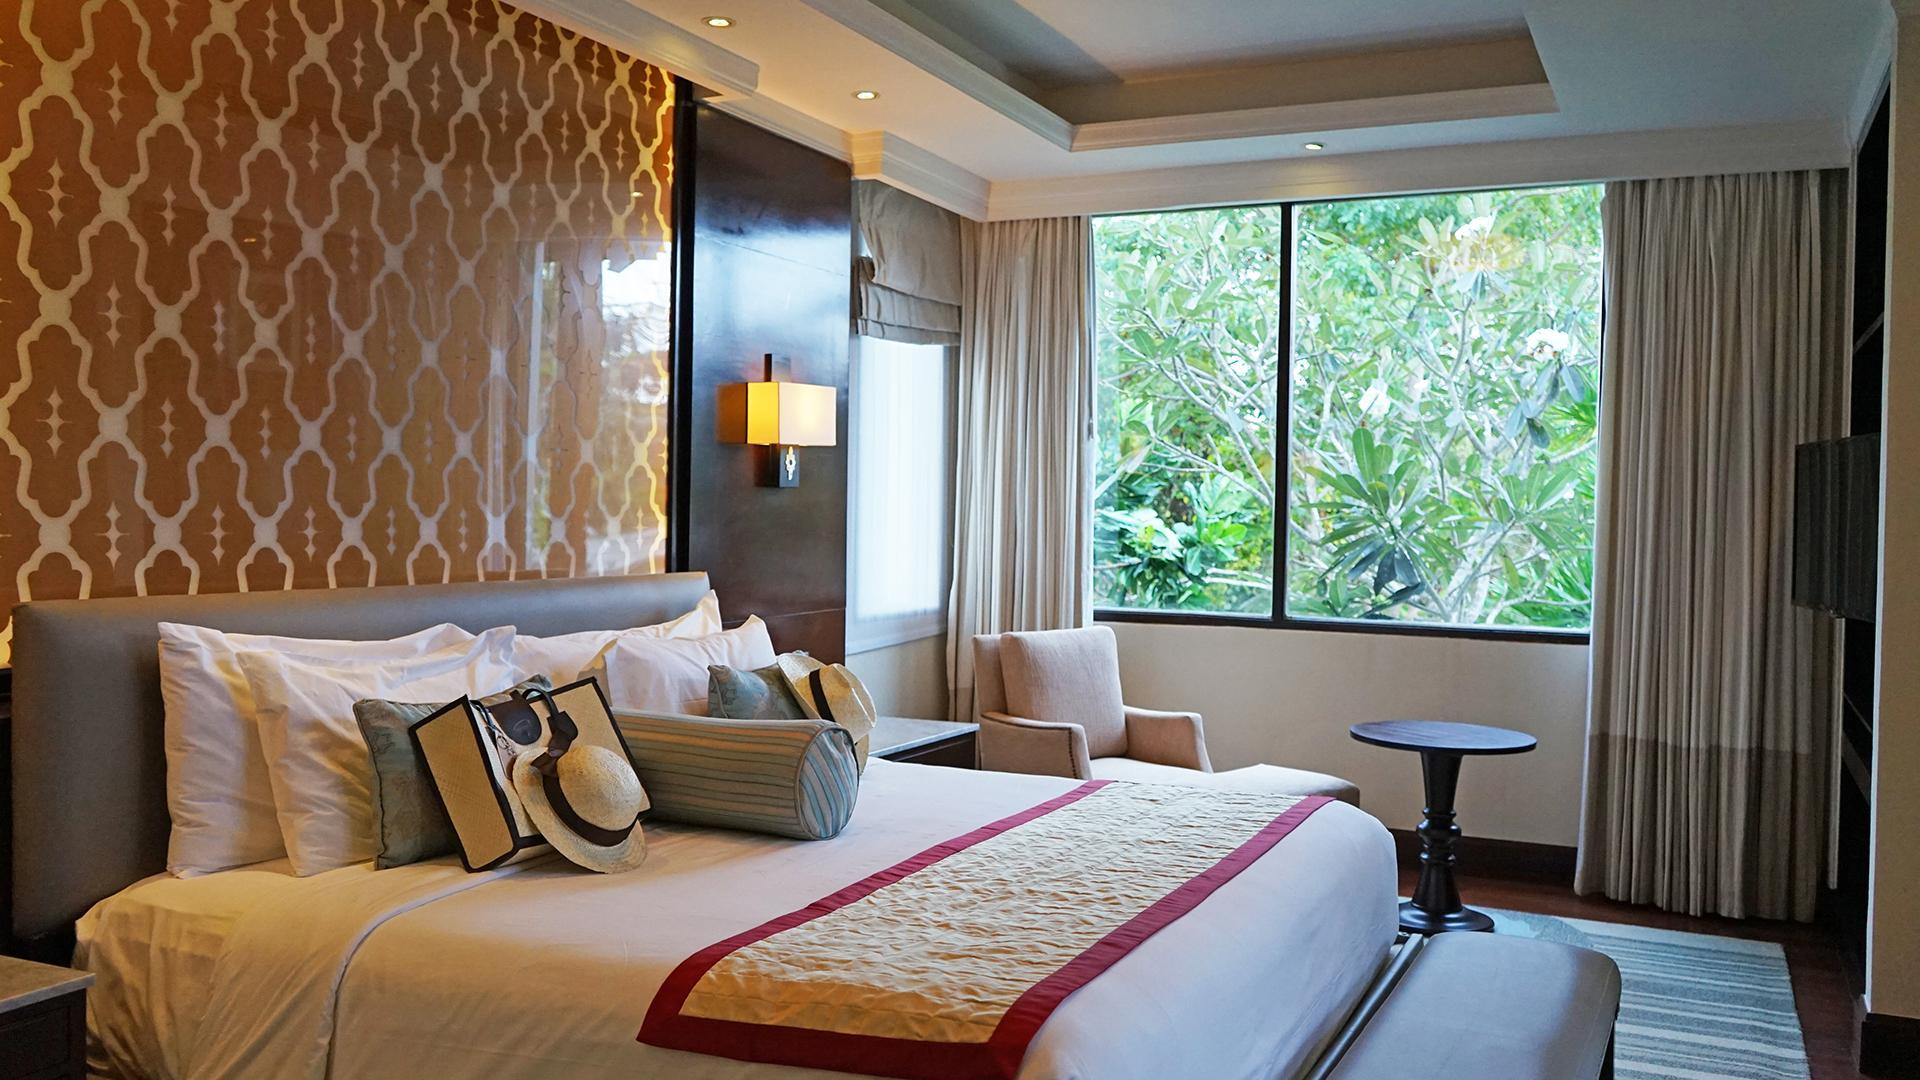 Two Bedroom Garden Pool Villa image 1 at Samabe Bali Suites & Villas by Kabupatén Badung, Bali, Indonesia